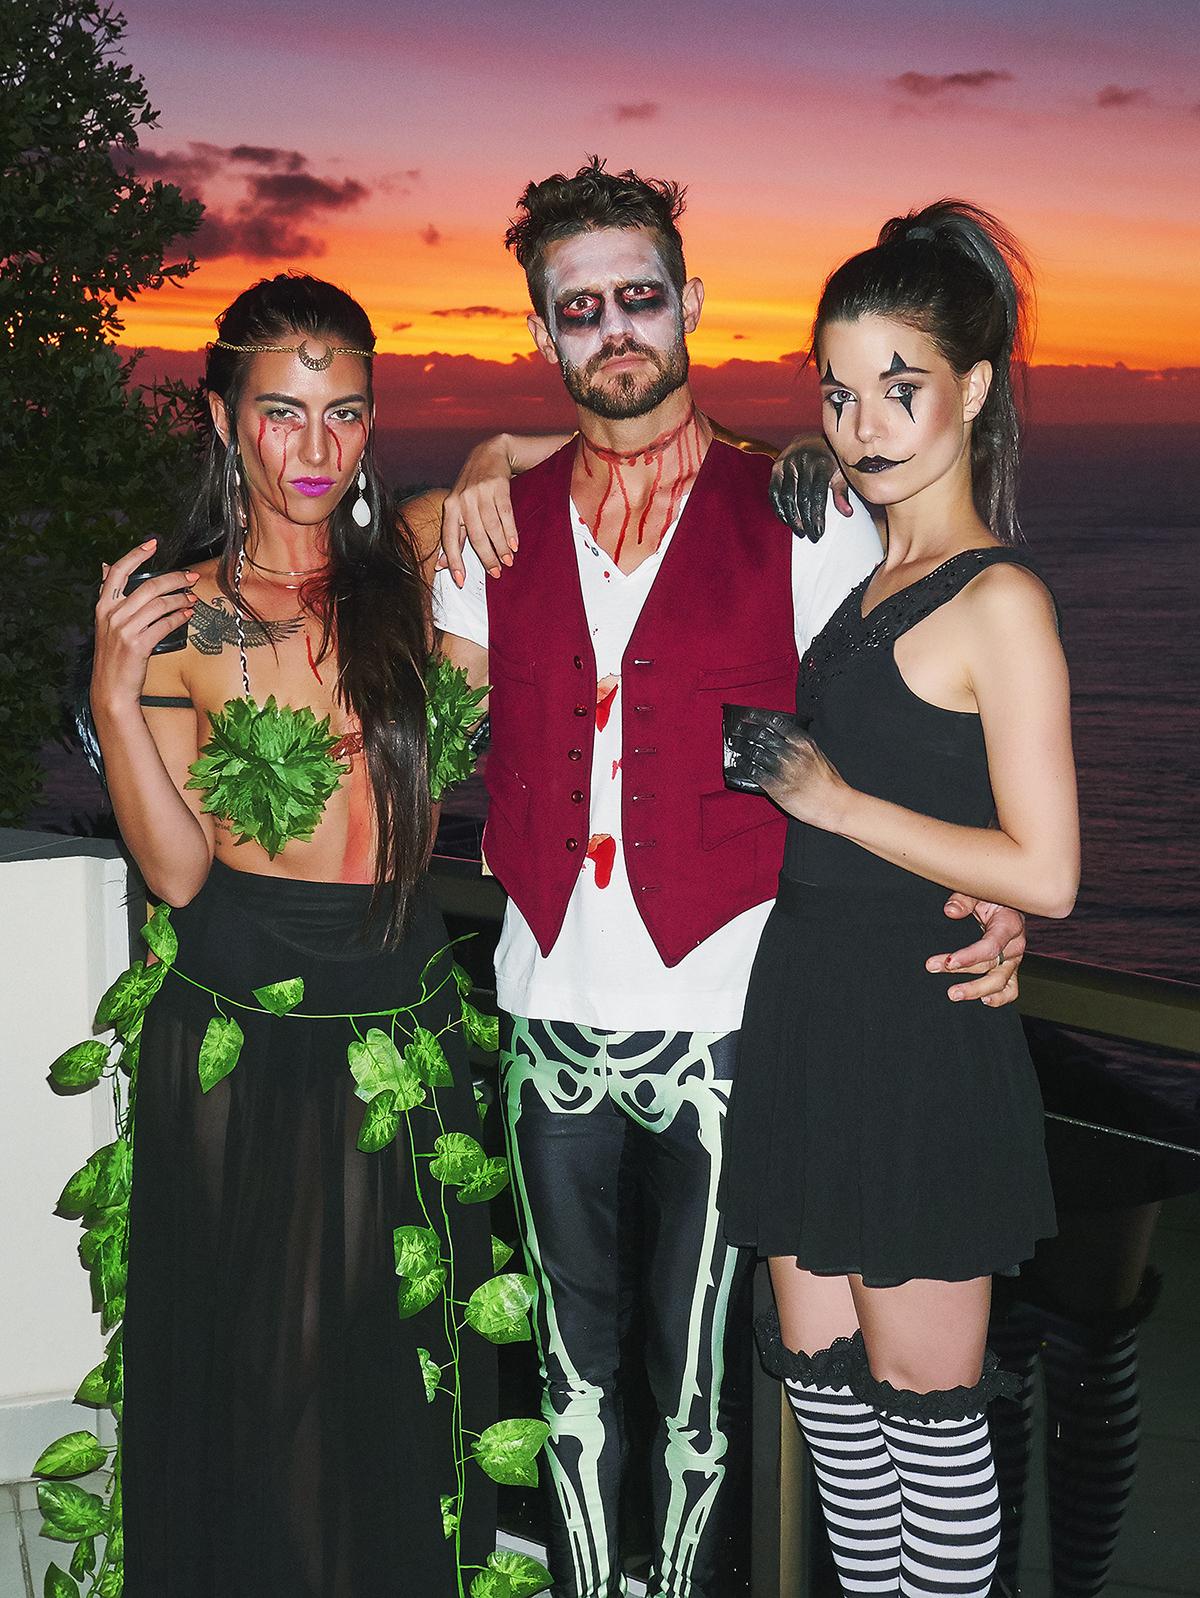 linnea-frank-halloween